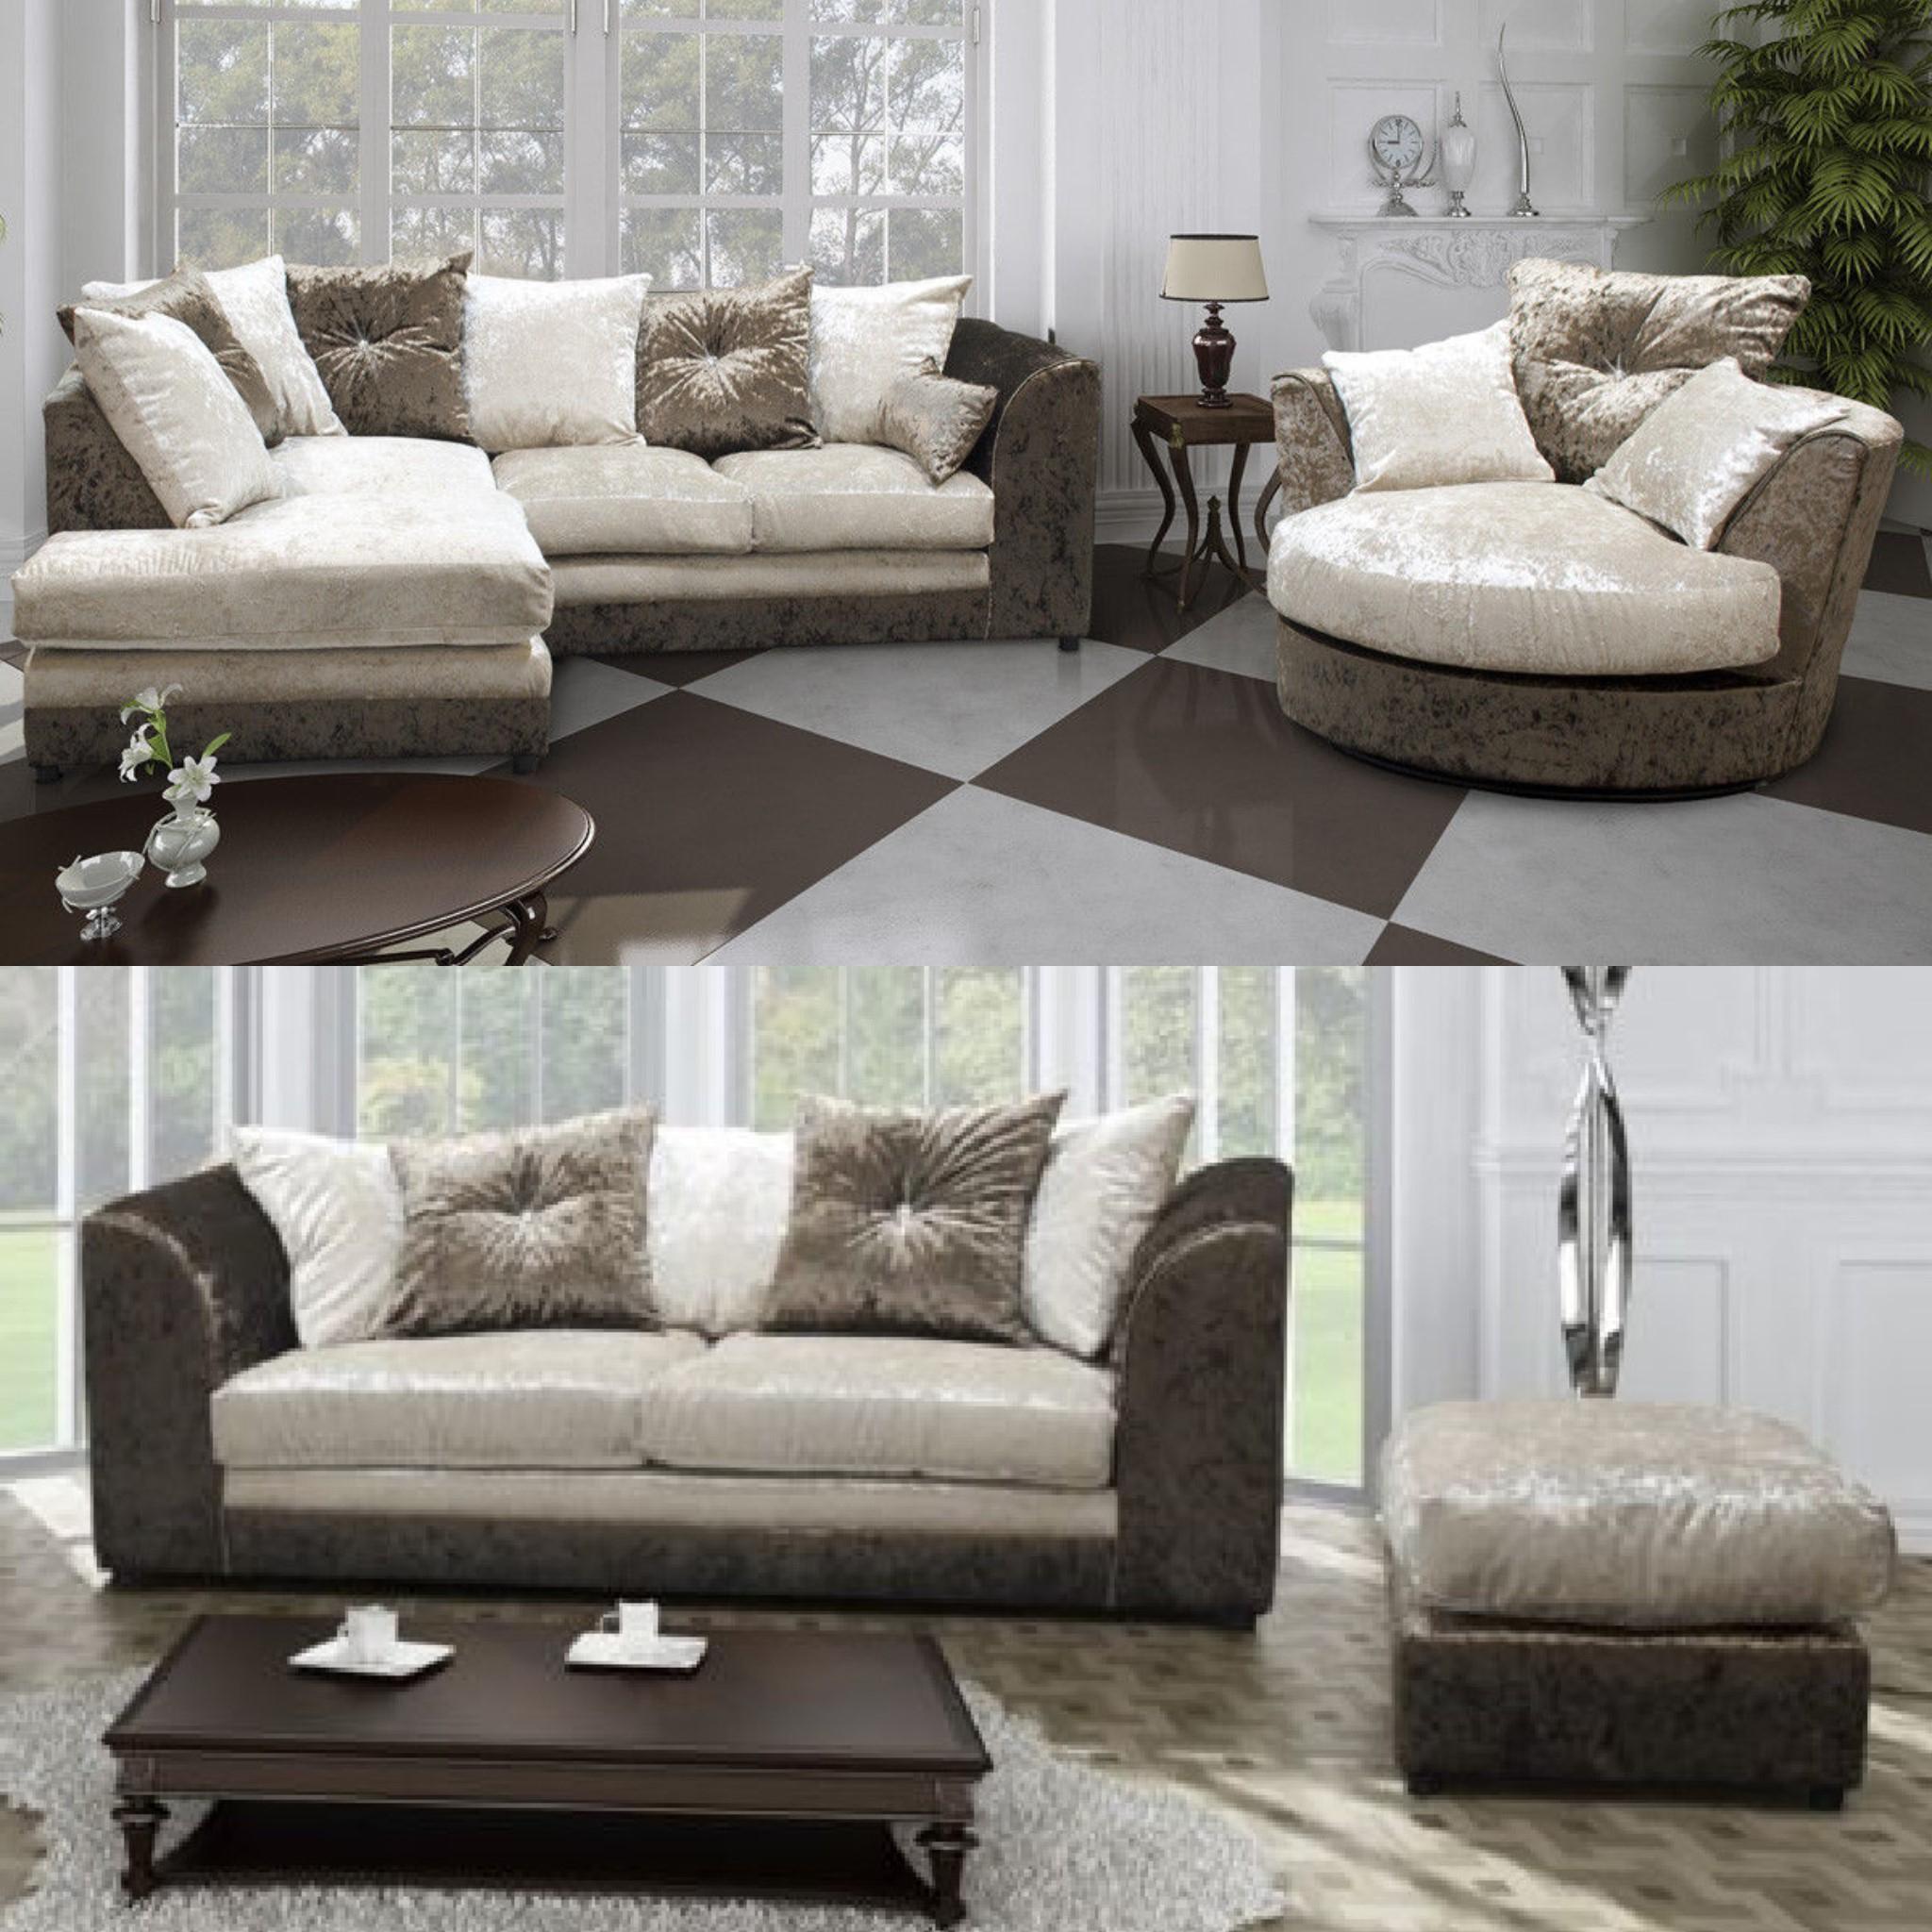 Widely Used Corner Sofa And Swivel Chairs Regarding Carlton Velvet Corner Sofa Set – Sofastorm (View 8 of 20)